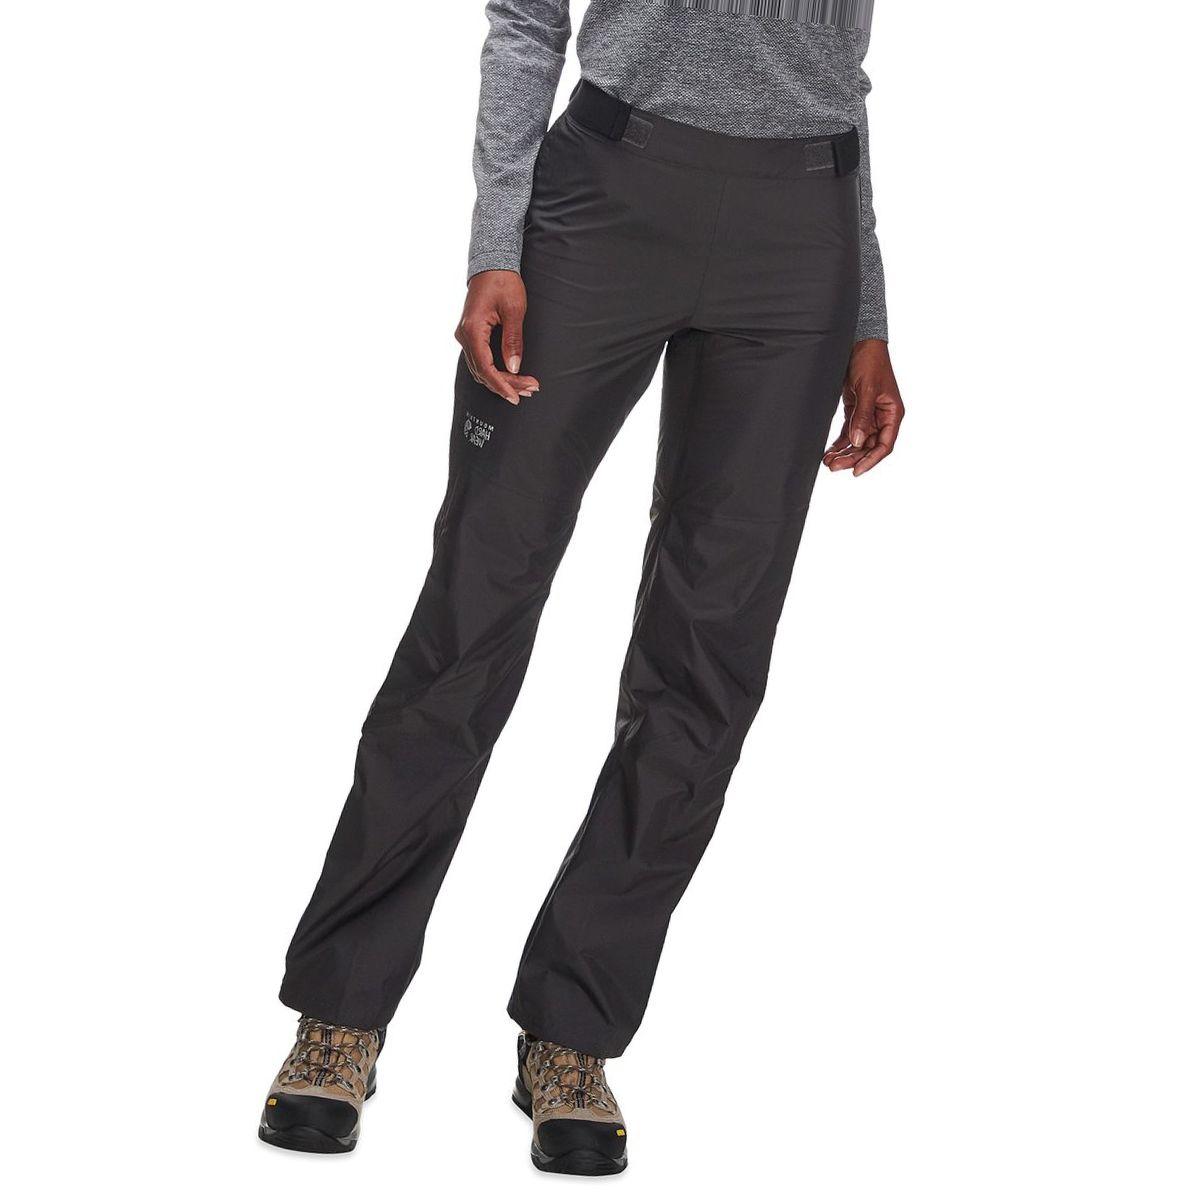 Mountain Hardwear Exposure/2 GTX Paclite Pant - Women's